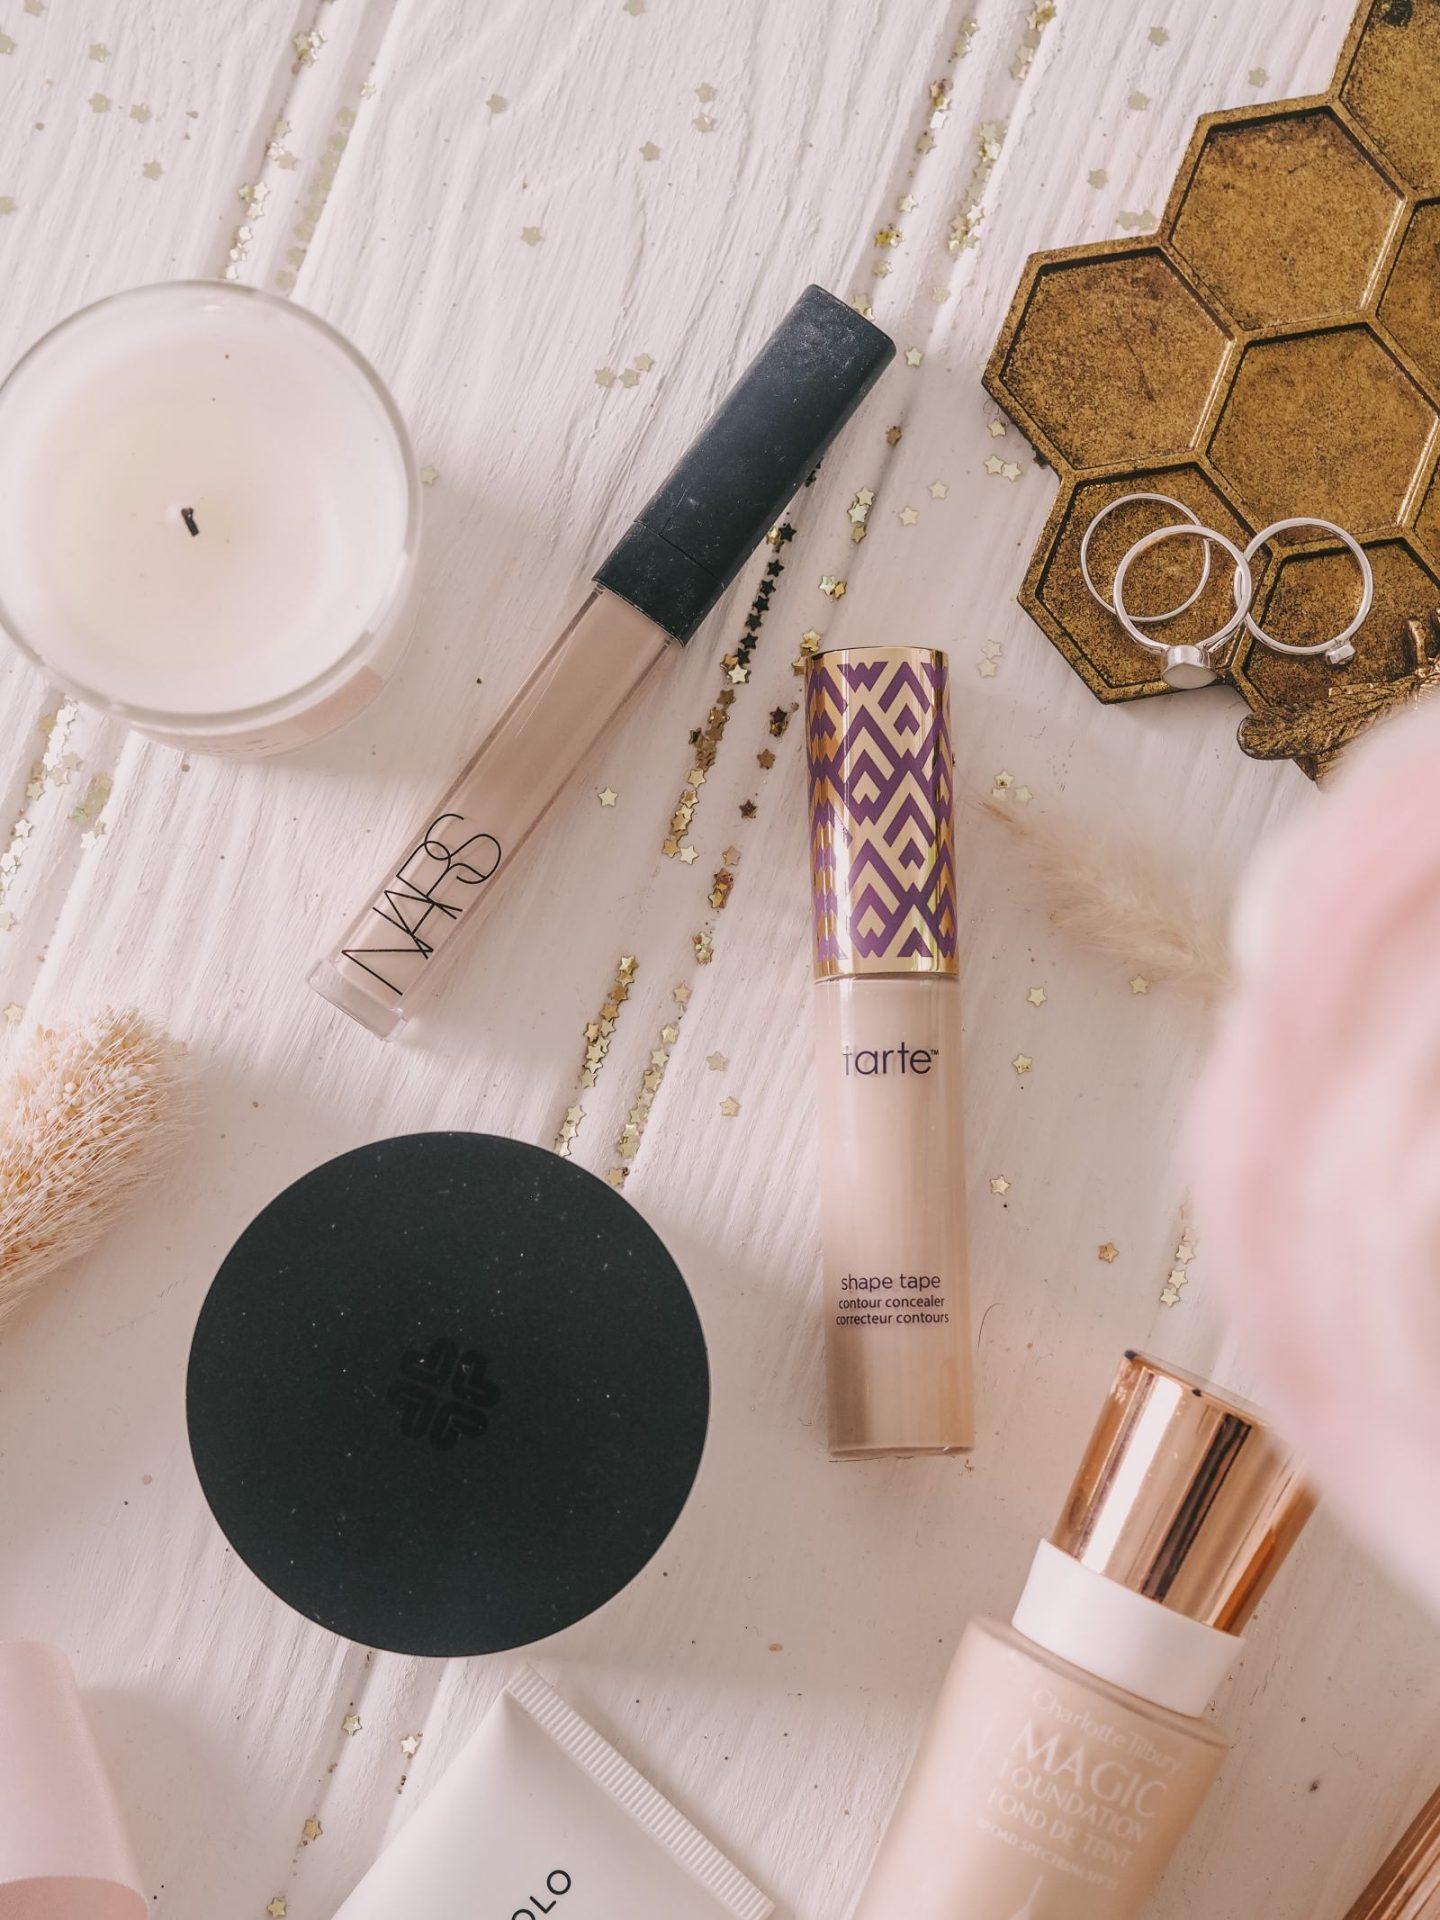 Ultimate Base Products for Fair Skin foundation concealer bb Cream Charlotte Tilbury Nars Tarte